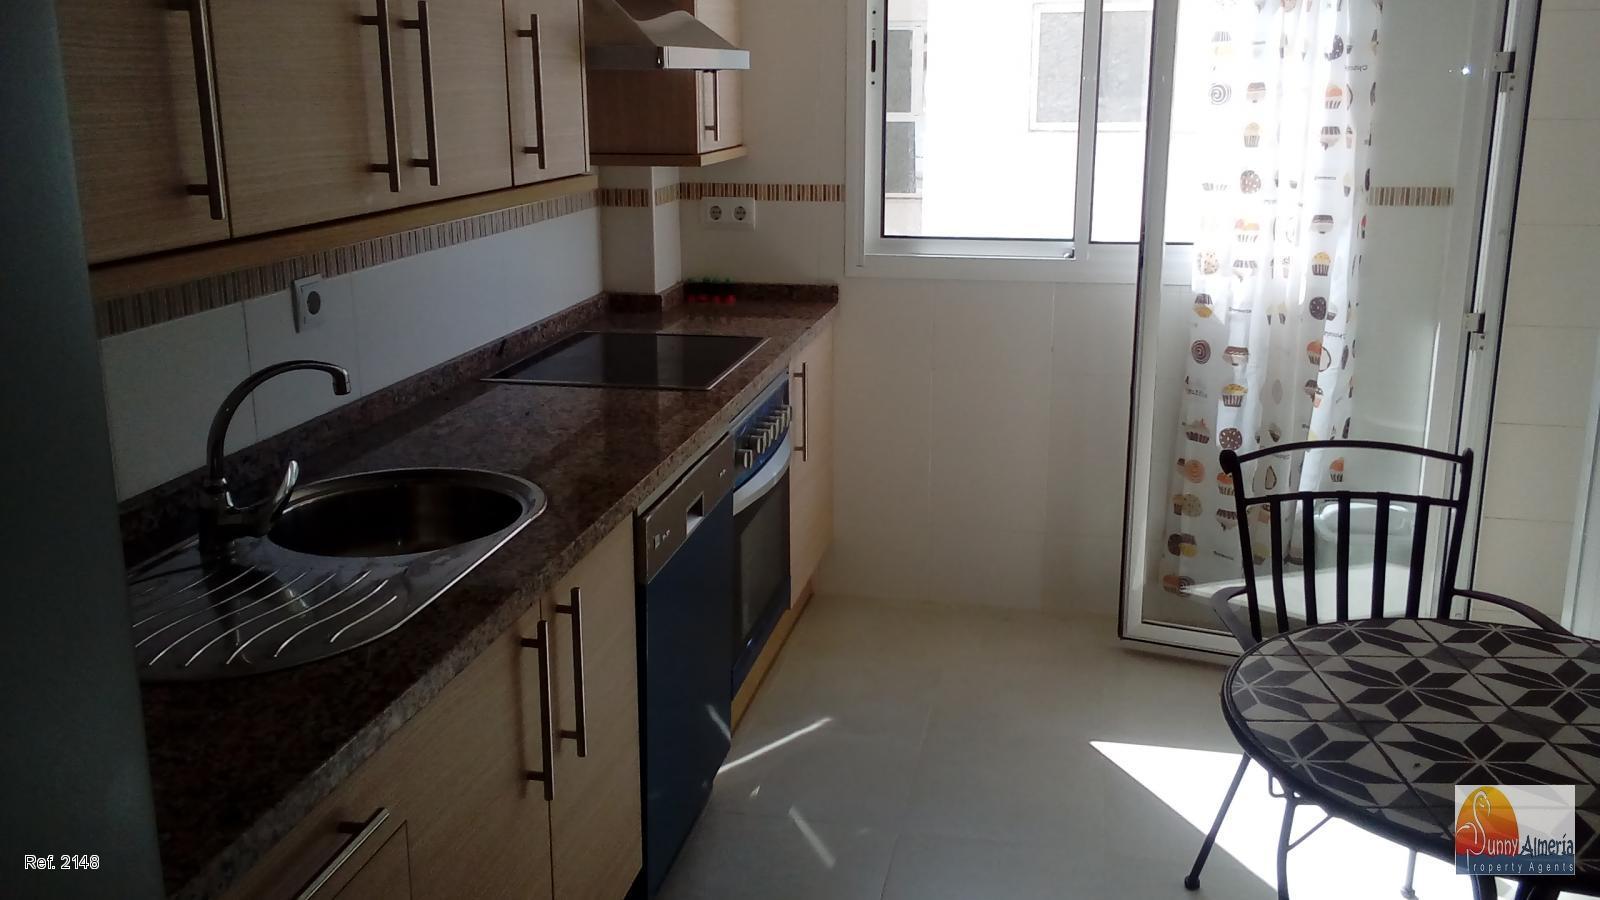 Appartamento di vacanza a Carretera Ciudad de Cadiz 1A (Roquetas de Mar), 850 €